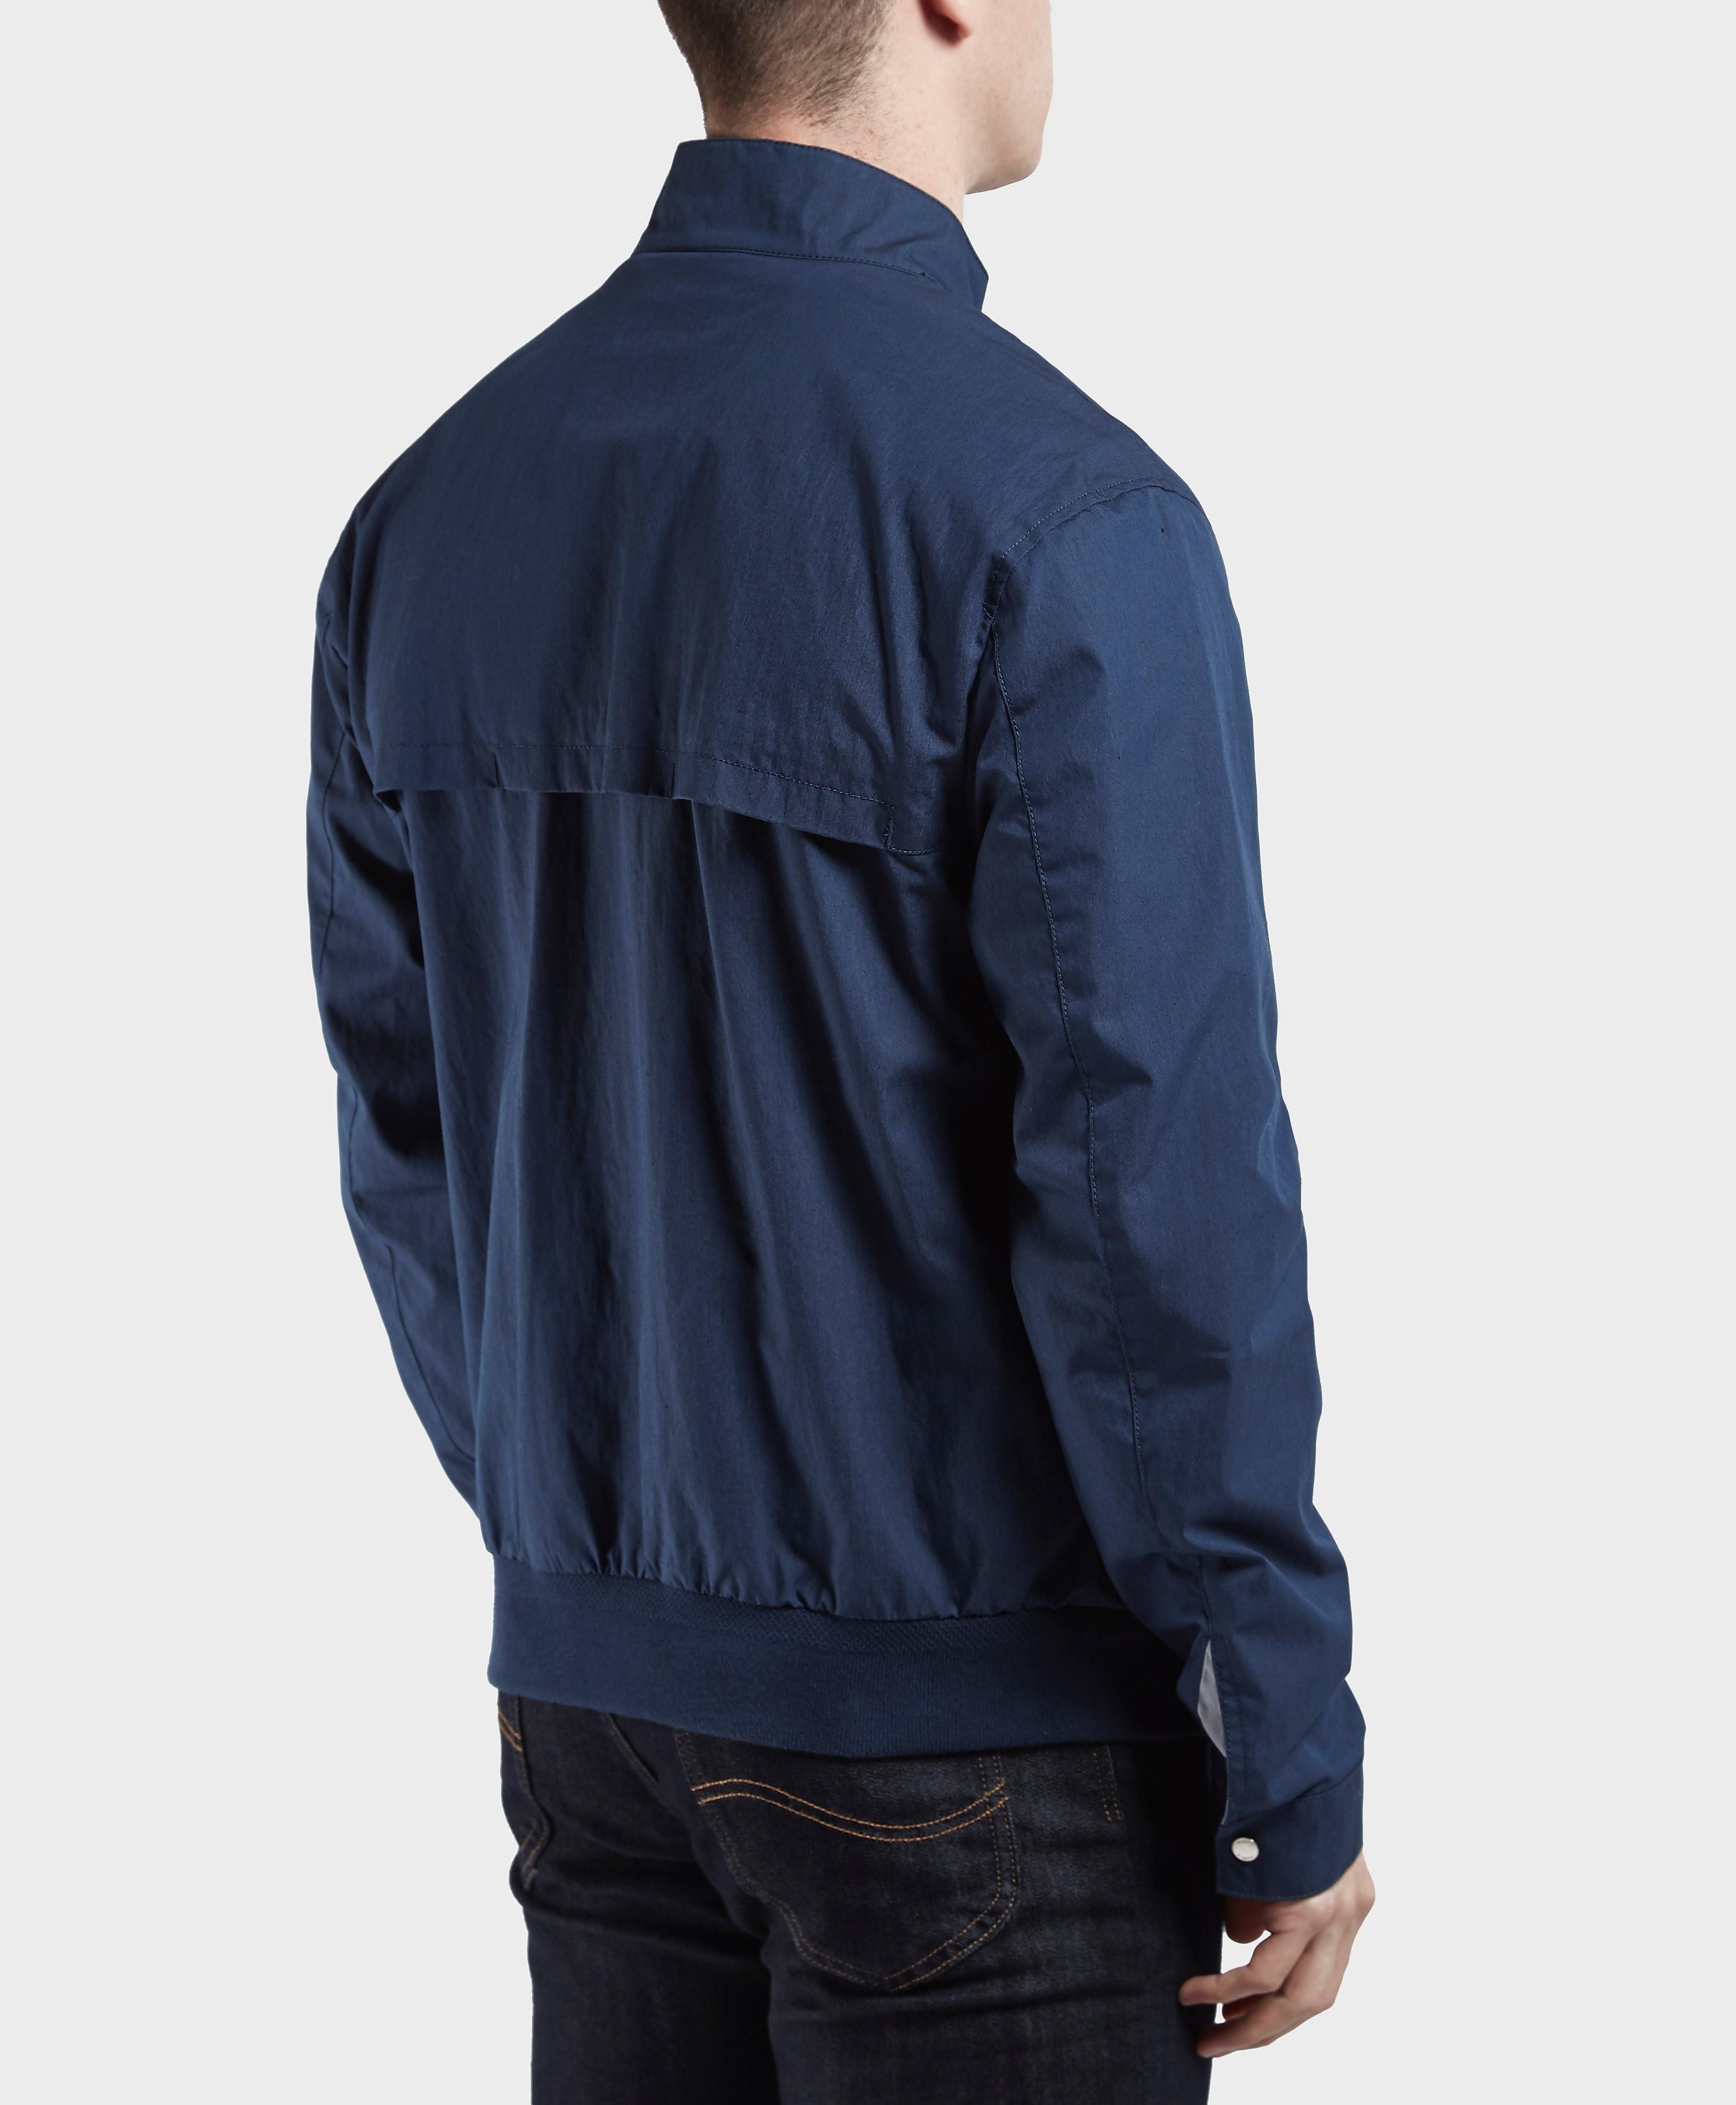 Lacoste Gab Blouson Lightweight Jacket